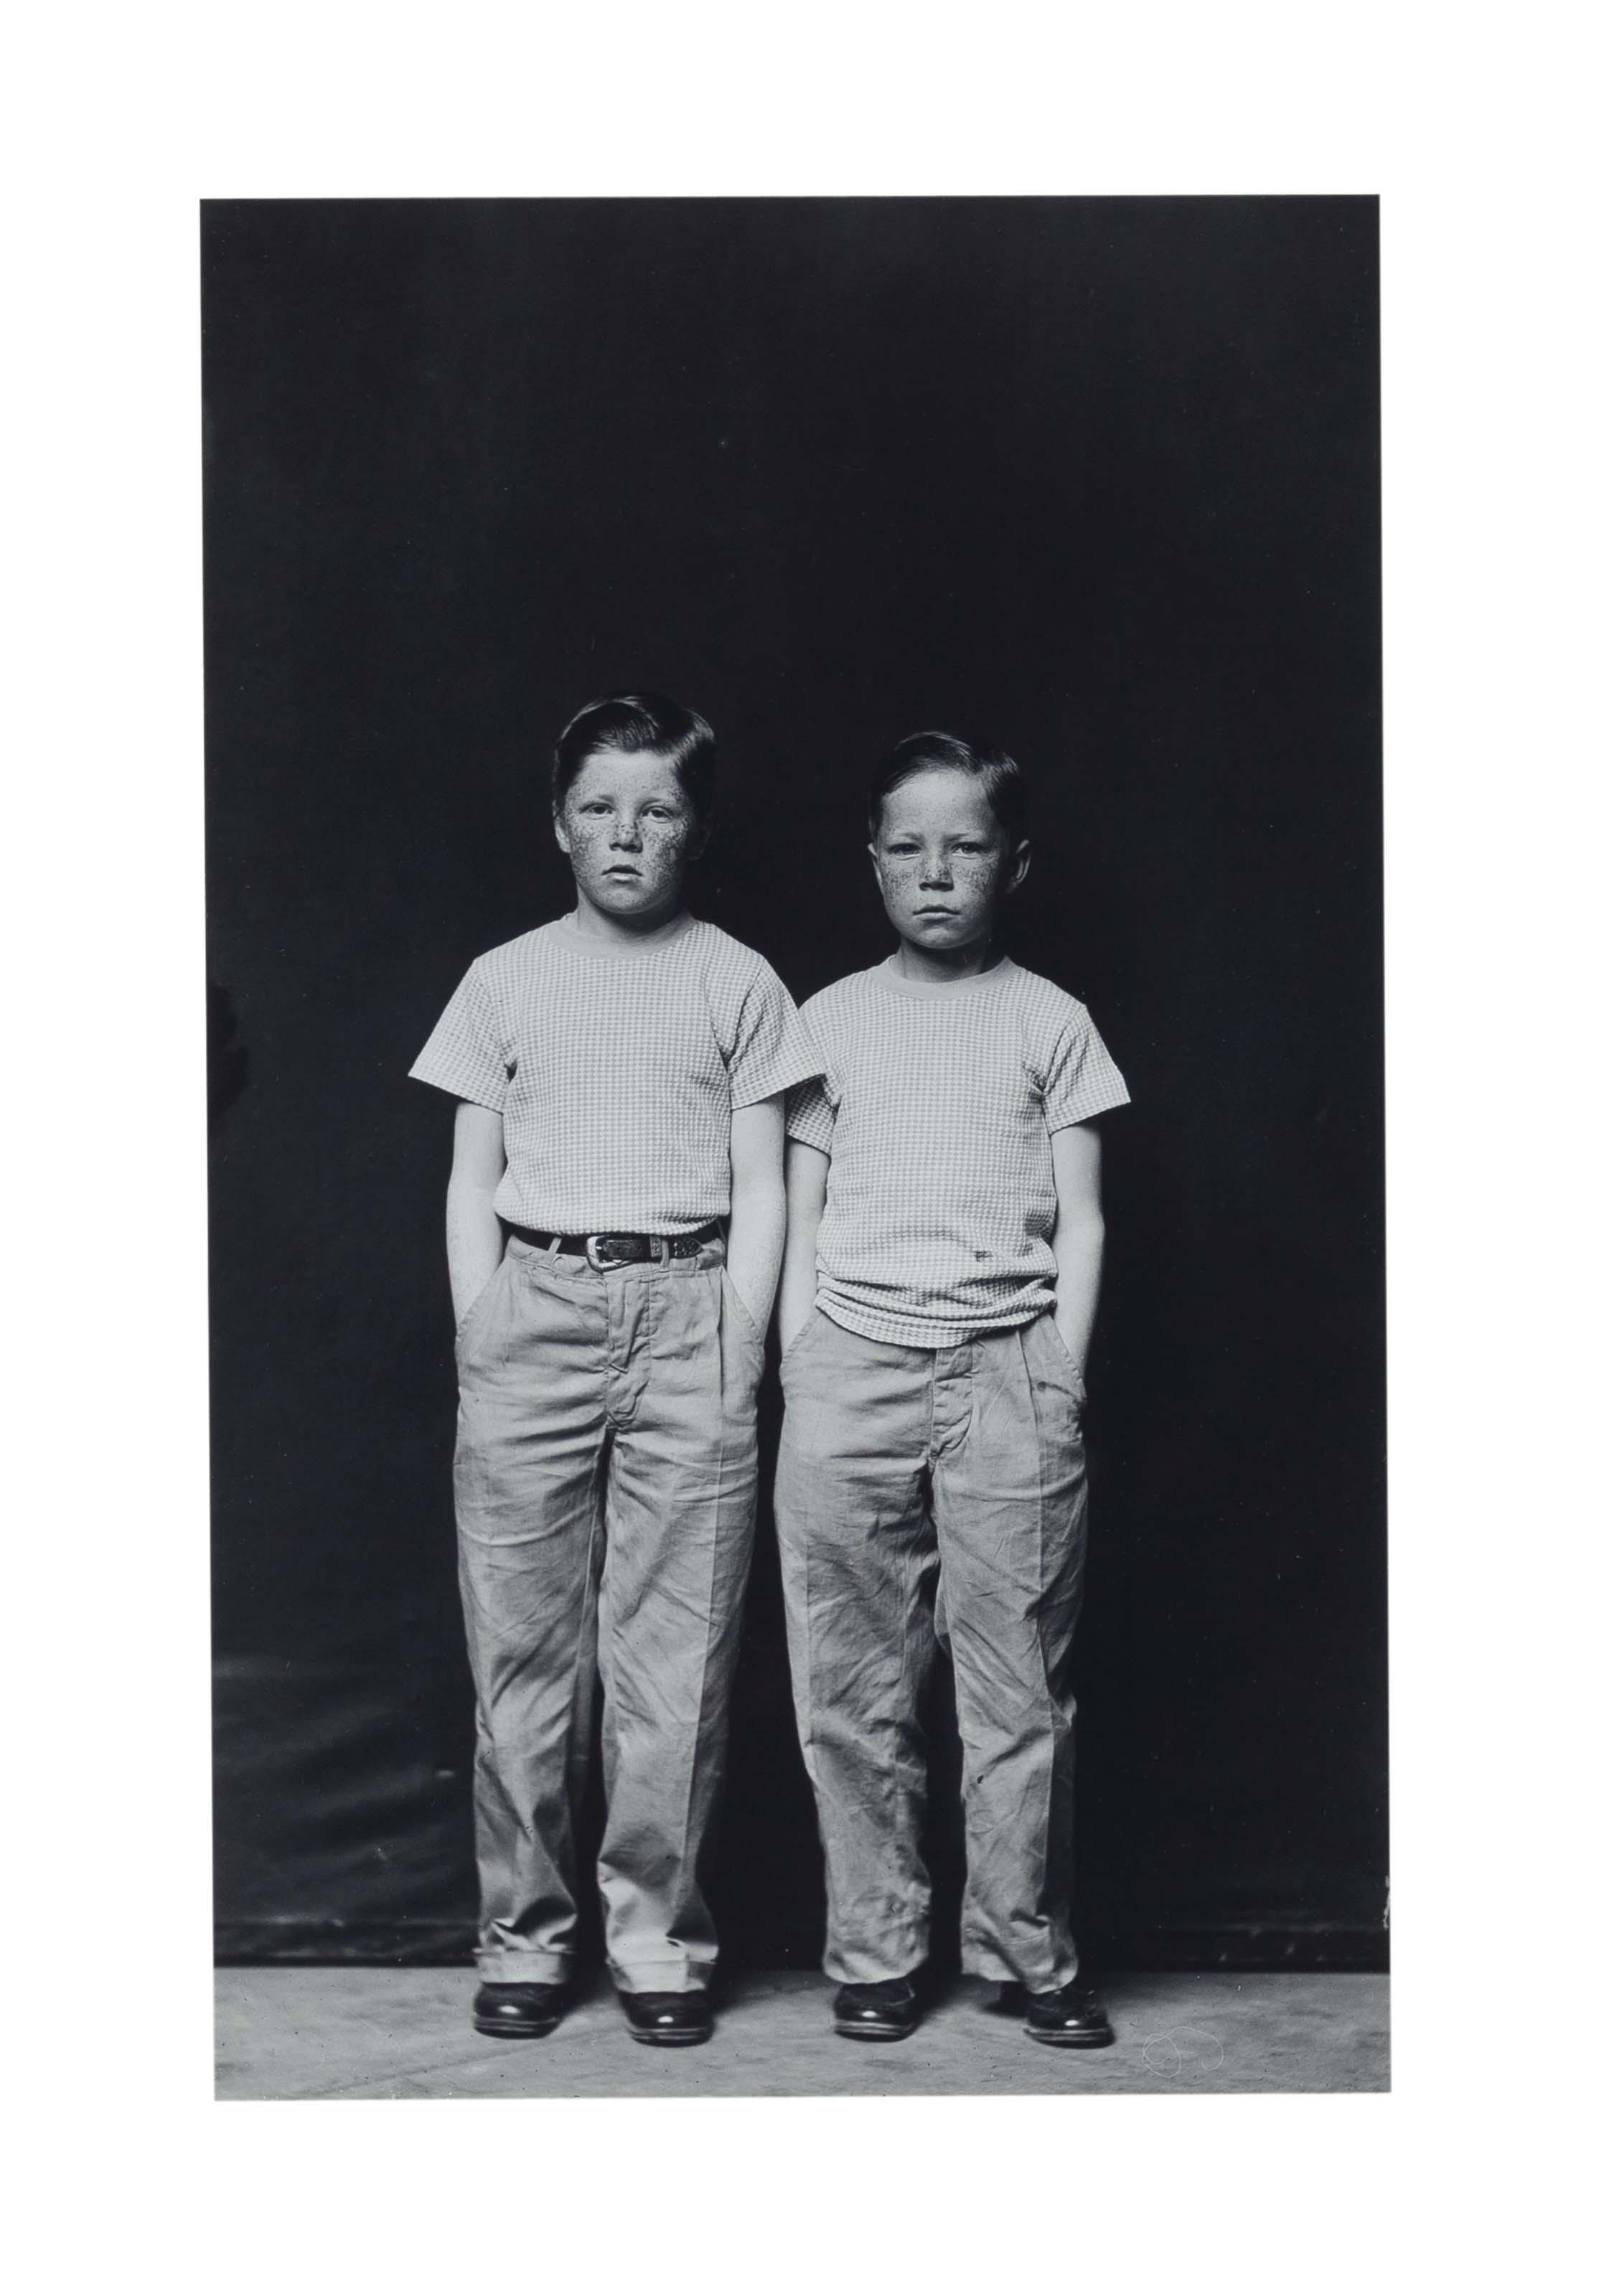 Twin Boys, c. 1940-1945